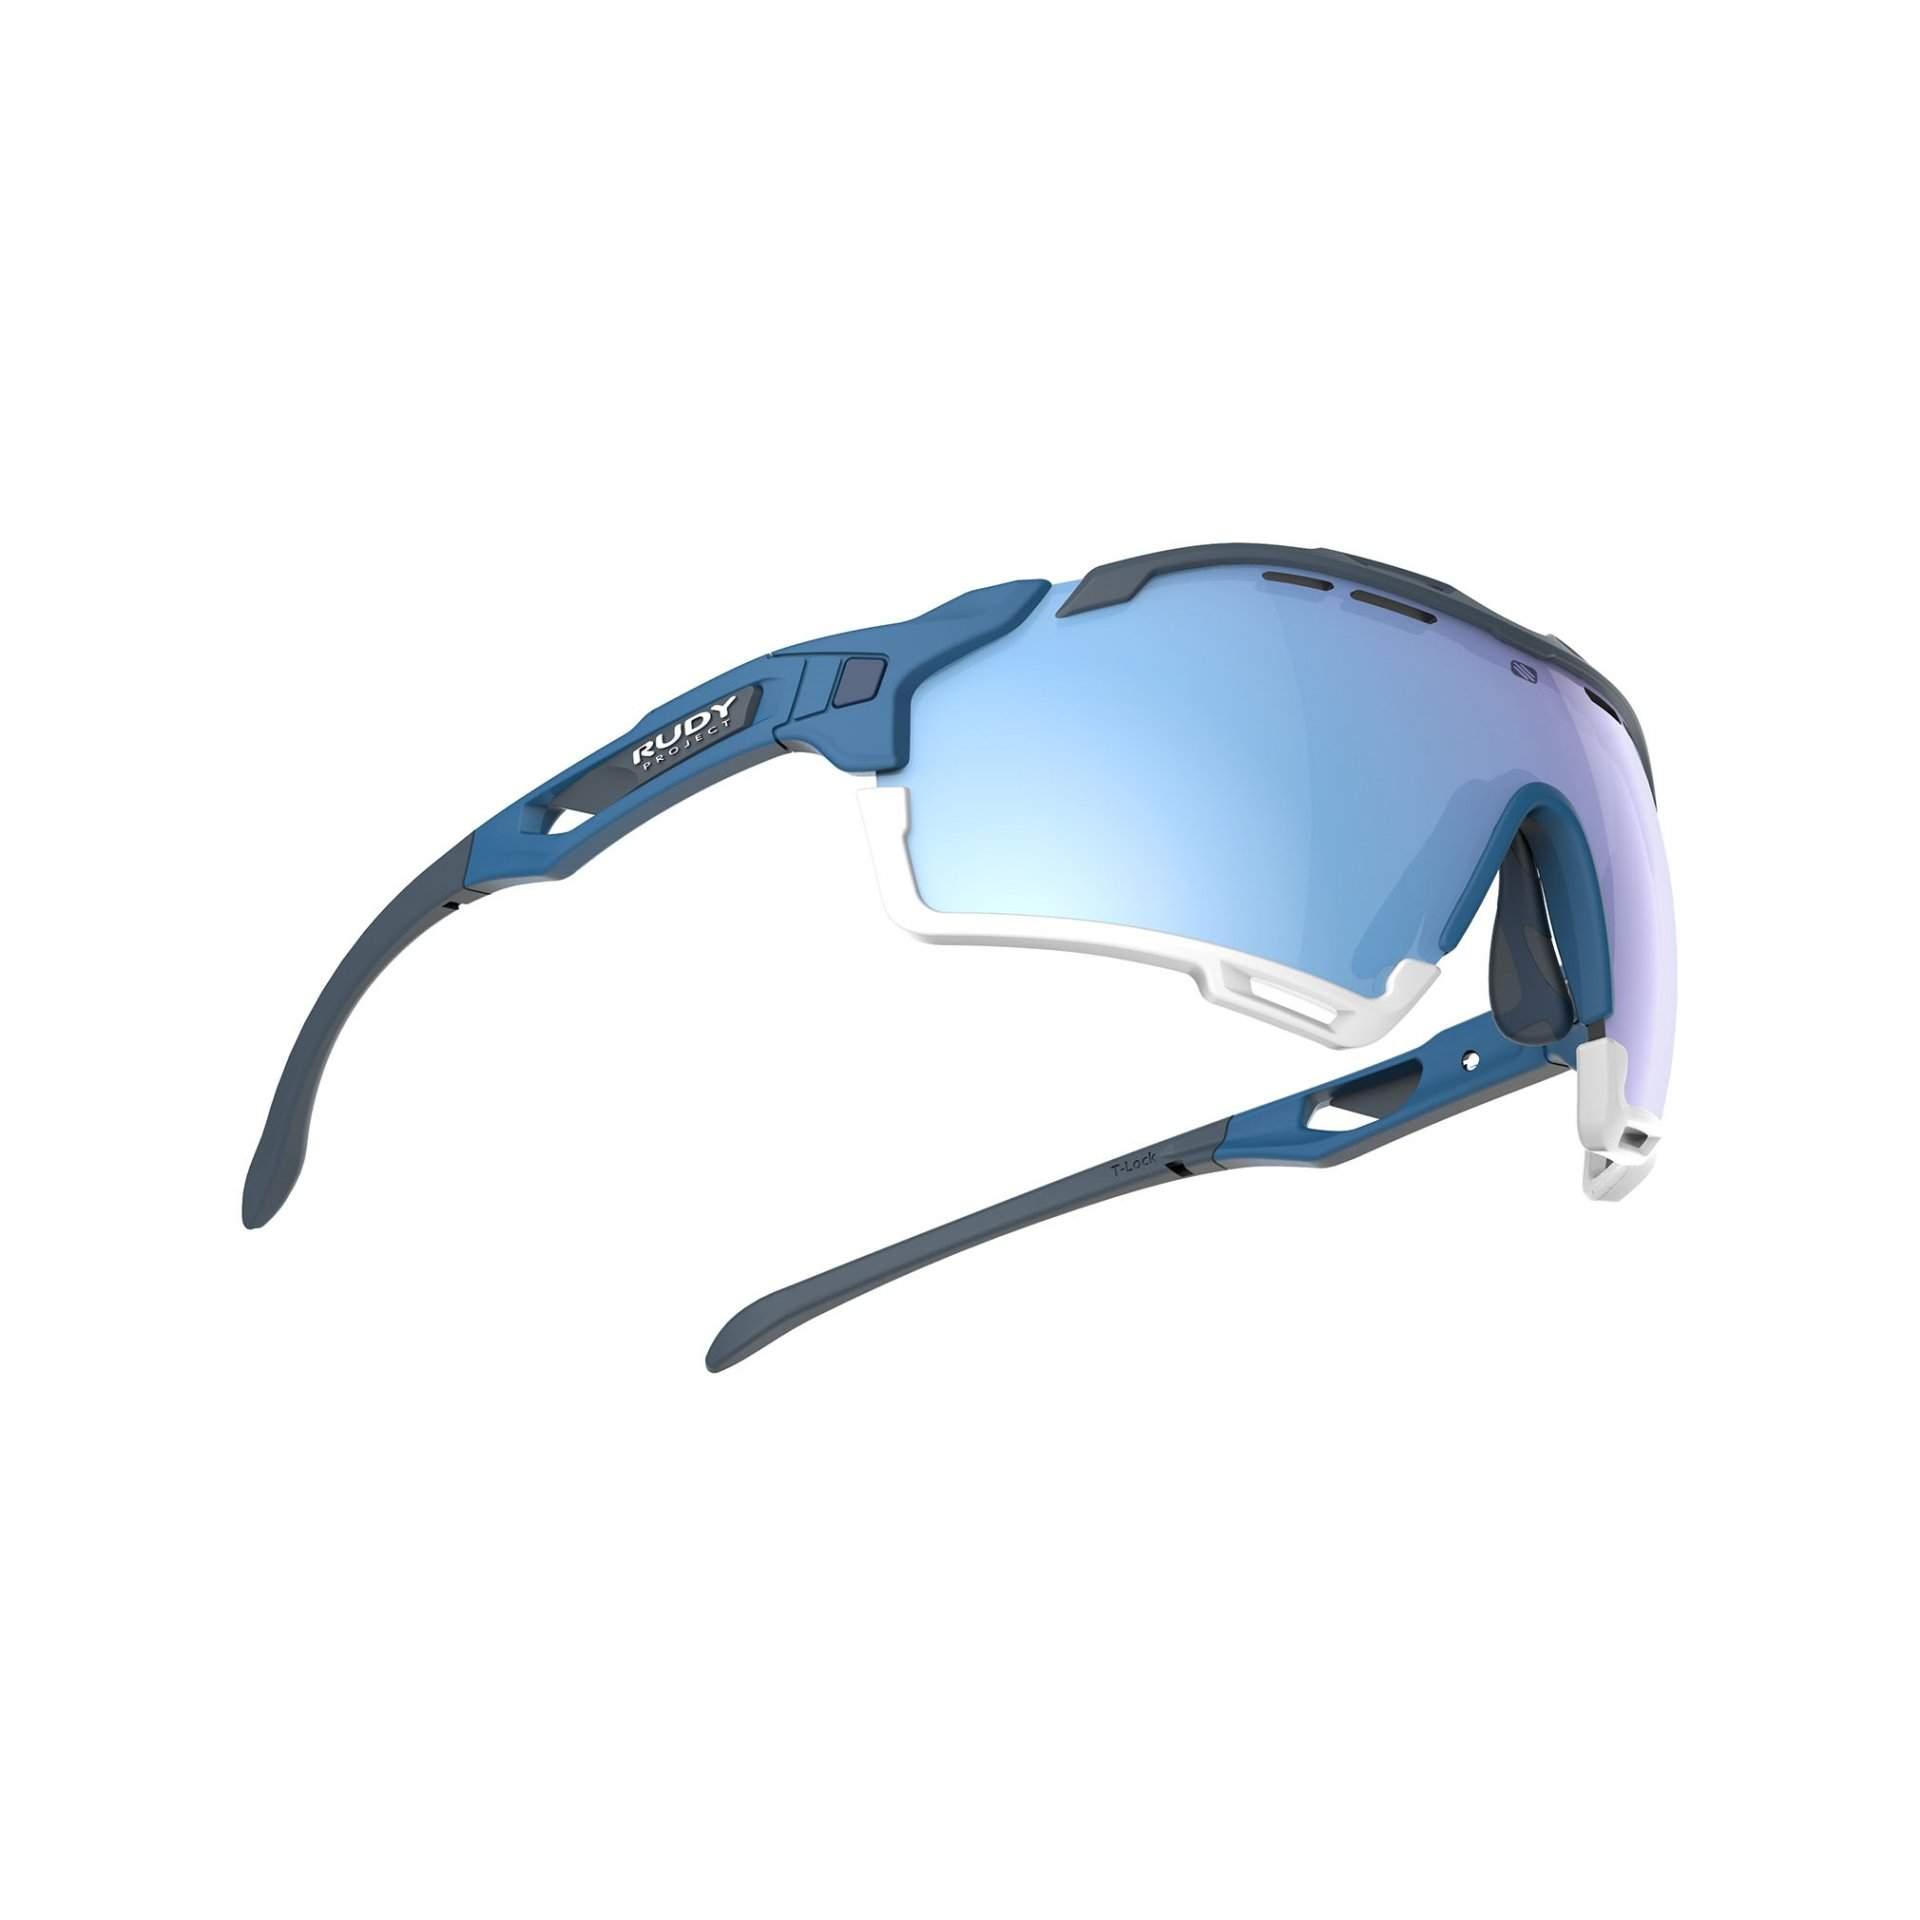 OKULARY RUDY PROJECT CUTLINE MULTILASER ICE + PACIFIC BLUE MATTE SP6368490000 Z DOŁU